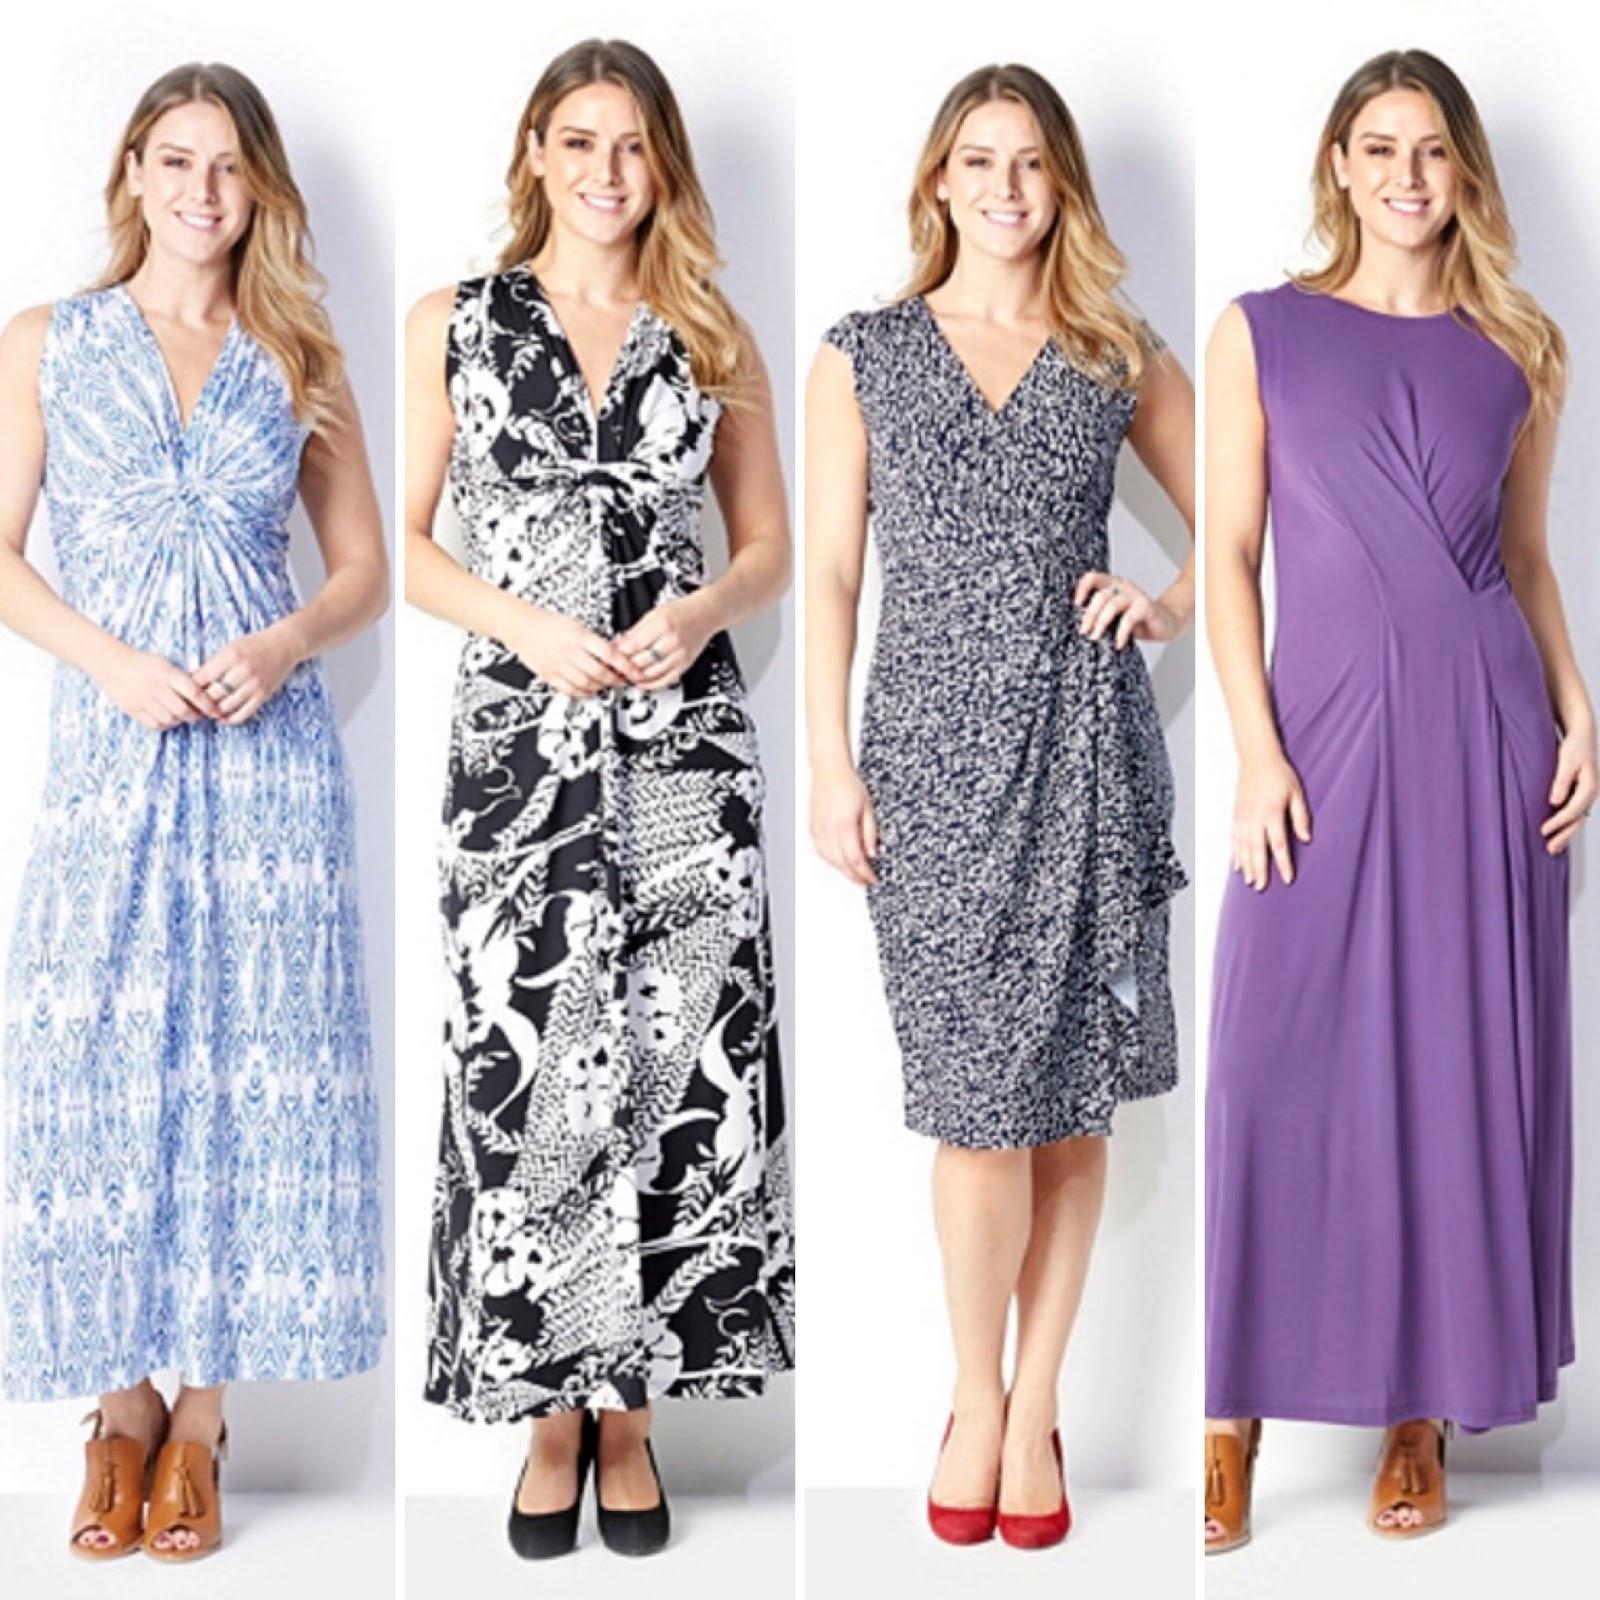 Nv nick verreosqvc uk nv nick verreos spring 2017 show recap spring dress fab nv nick verreos qvc uk spring 2017 dresses click here to shop ccuart Gallery